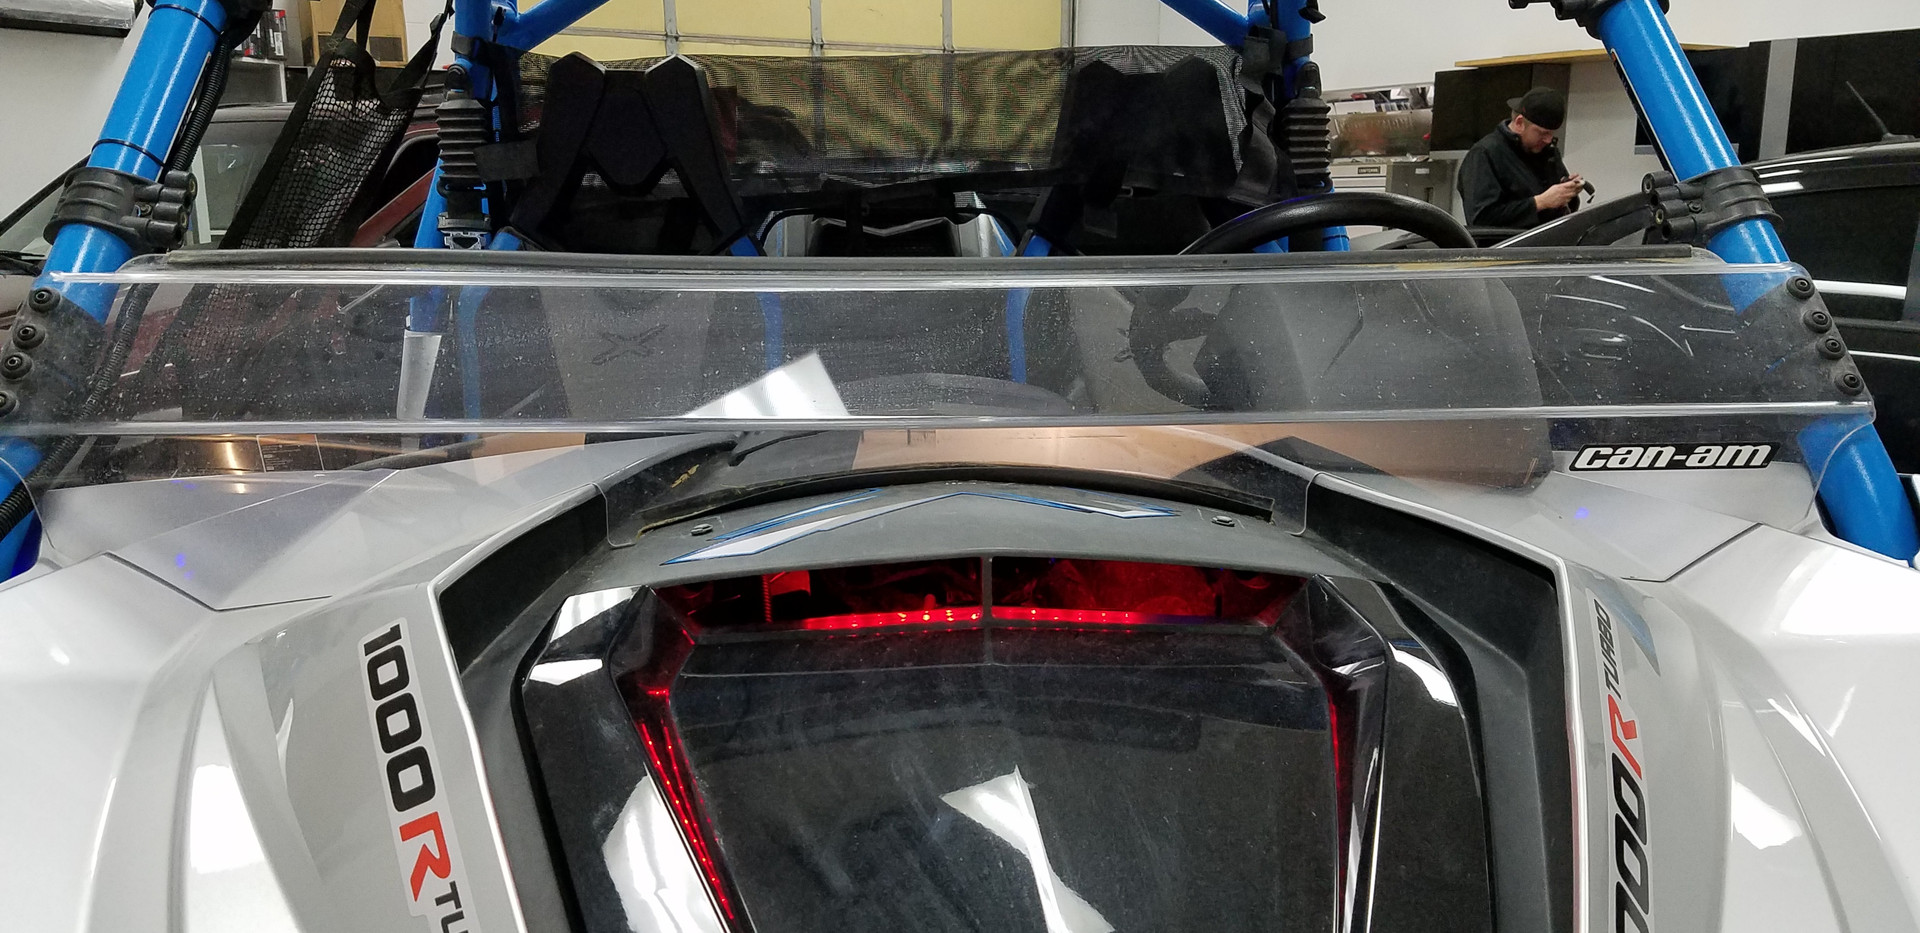 CAN-AM Maverick 1000 Turbo